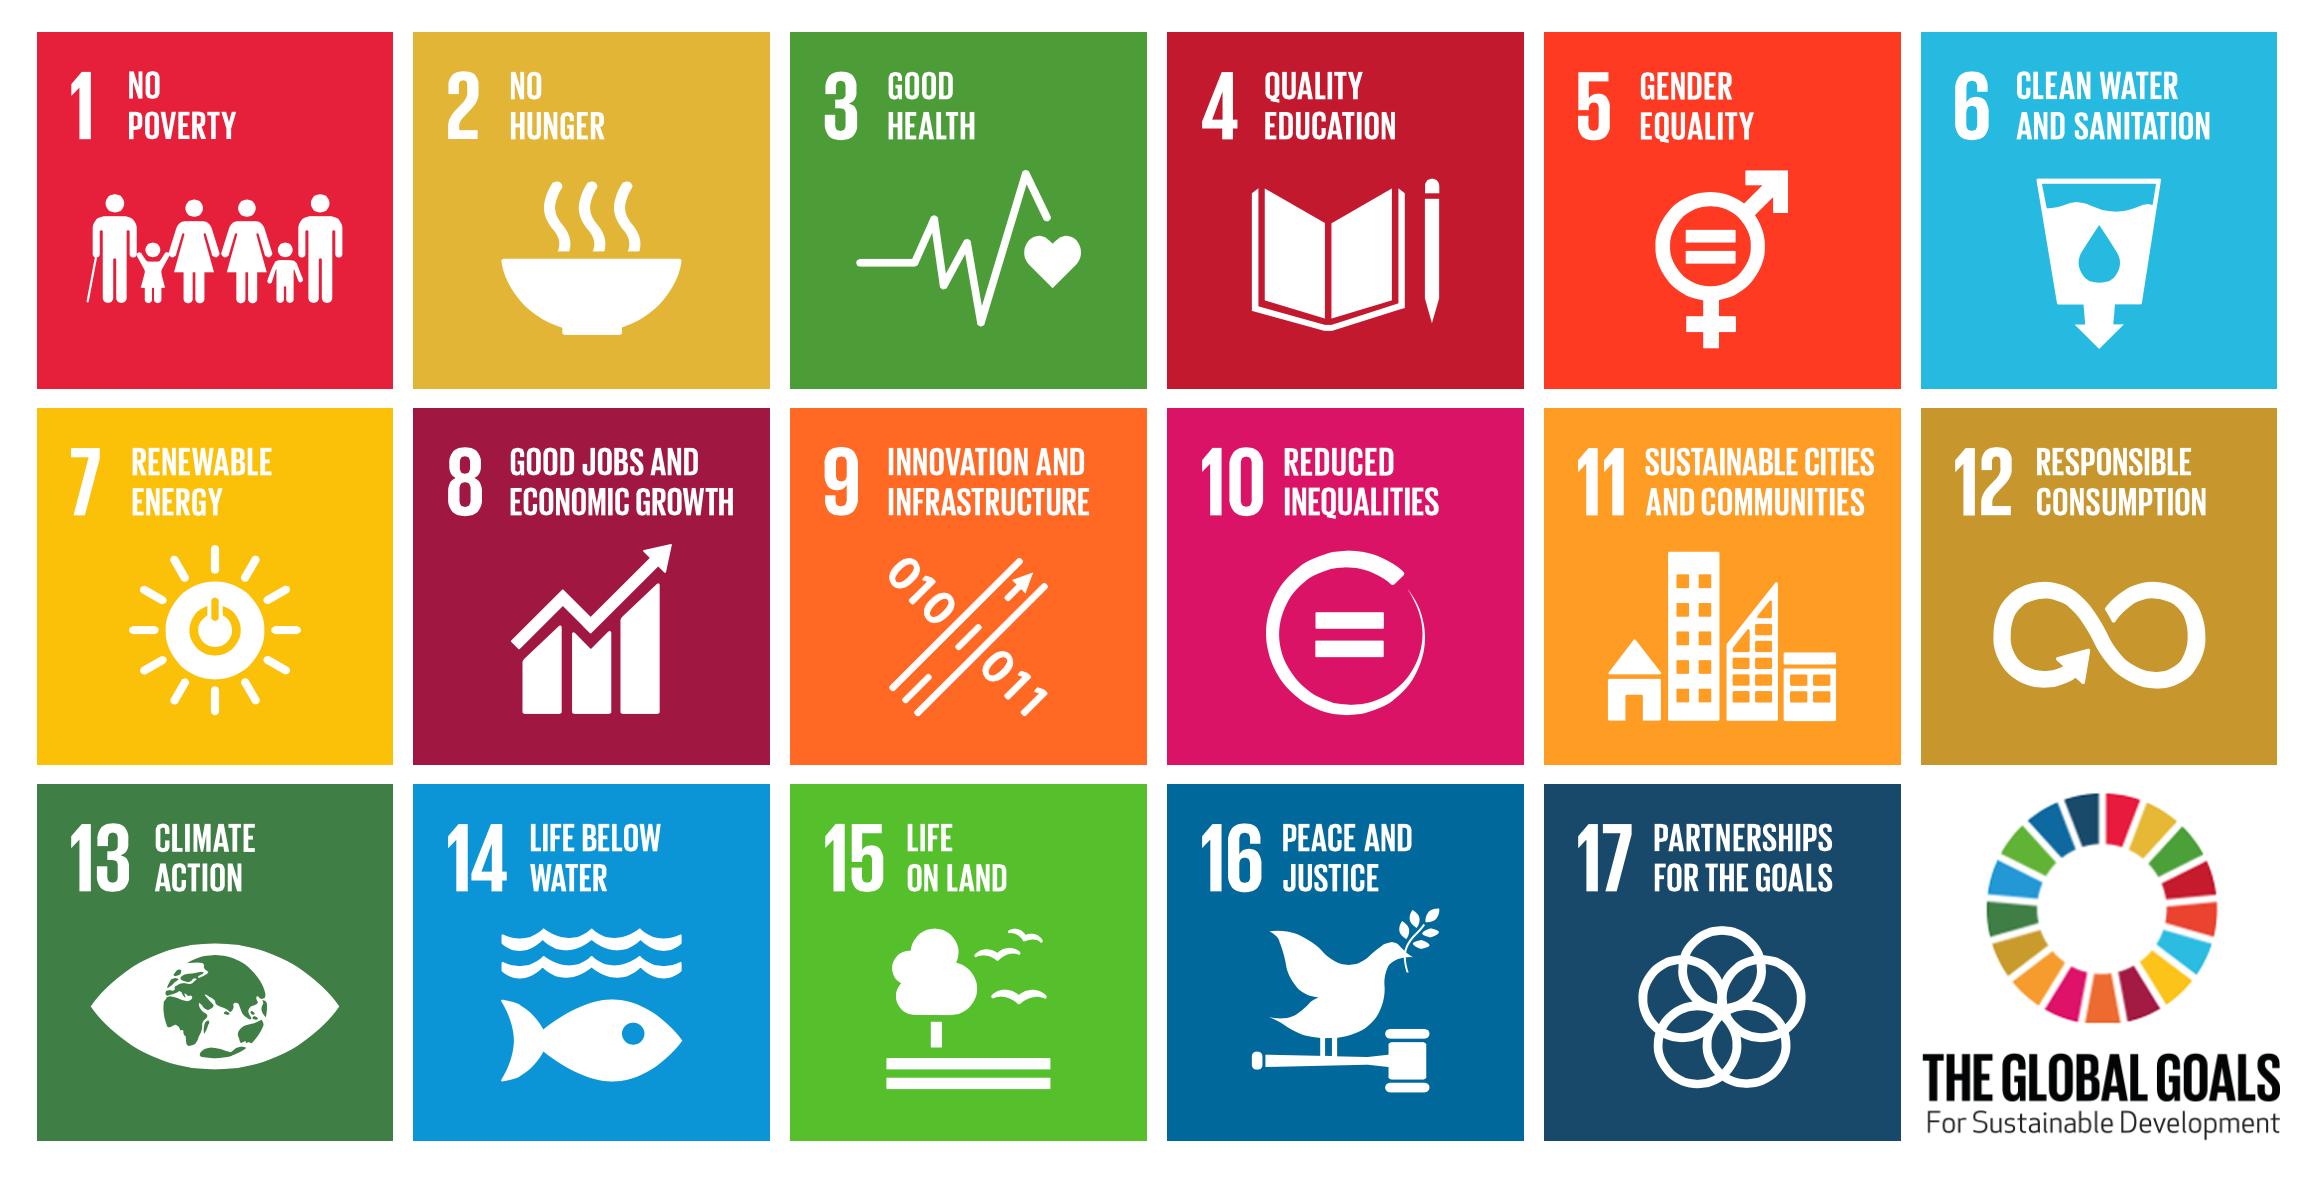 Chart_of_UN_Sustainable_Development_Goals.png